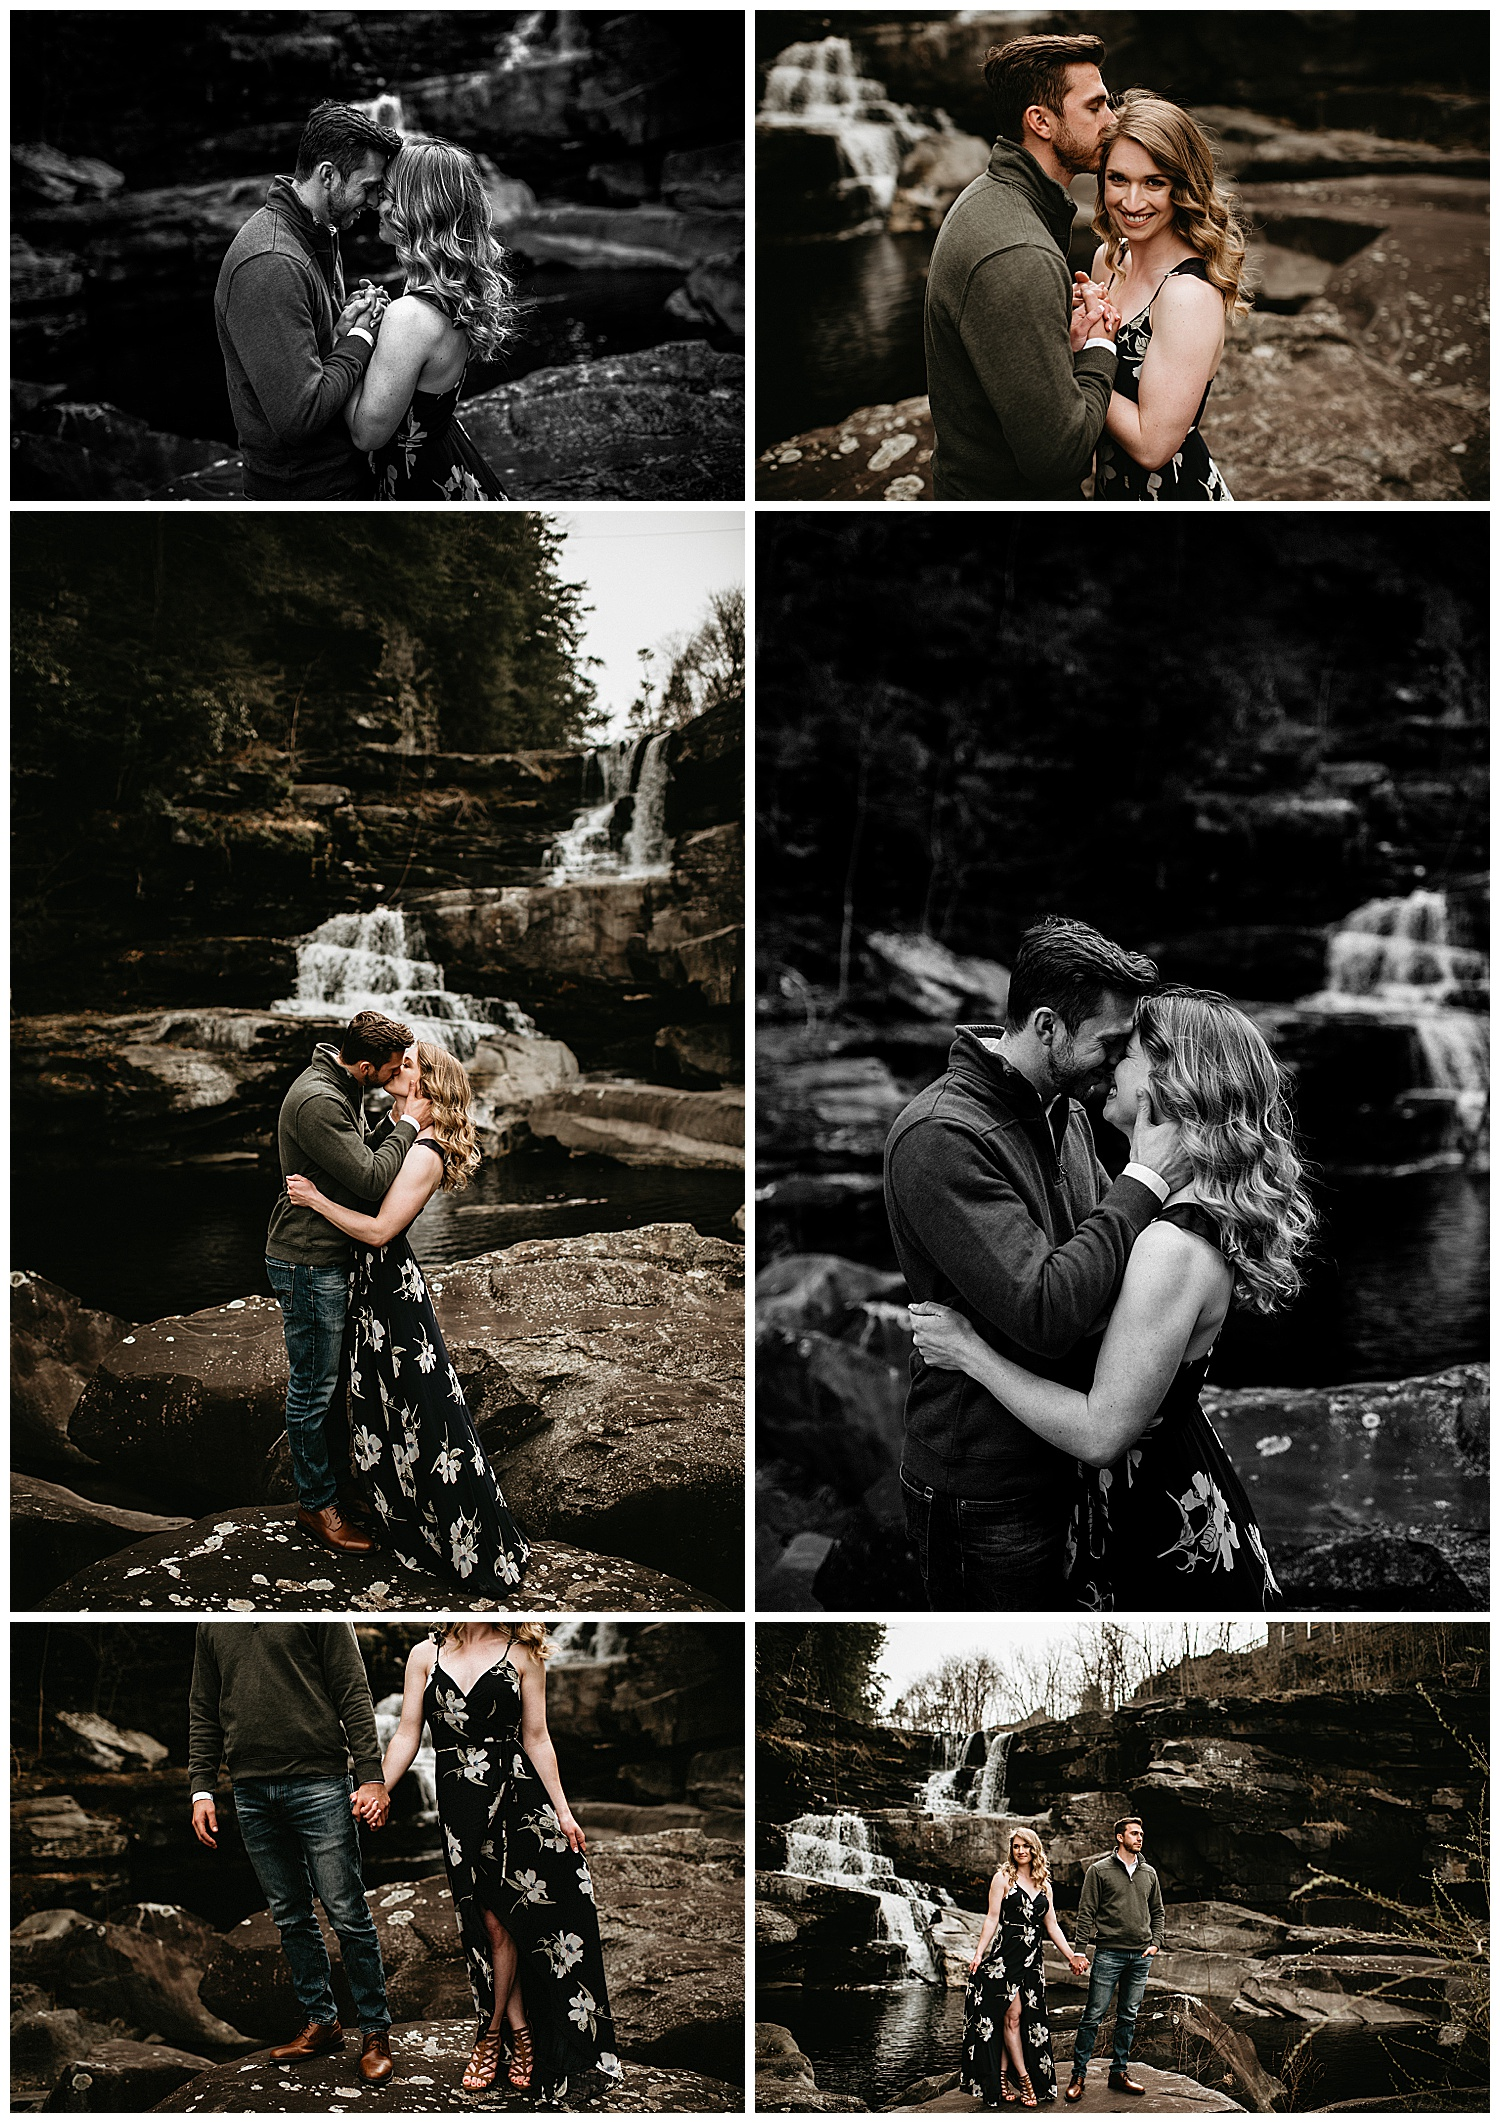 NEPA-Lehigh-Valley-Wedding-Photographer-Ledges-Hotel-Hawley-PA_0012.jpg